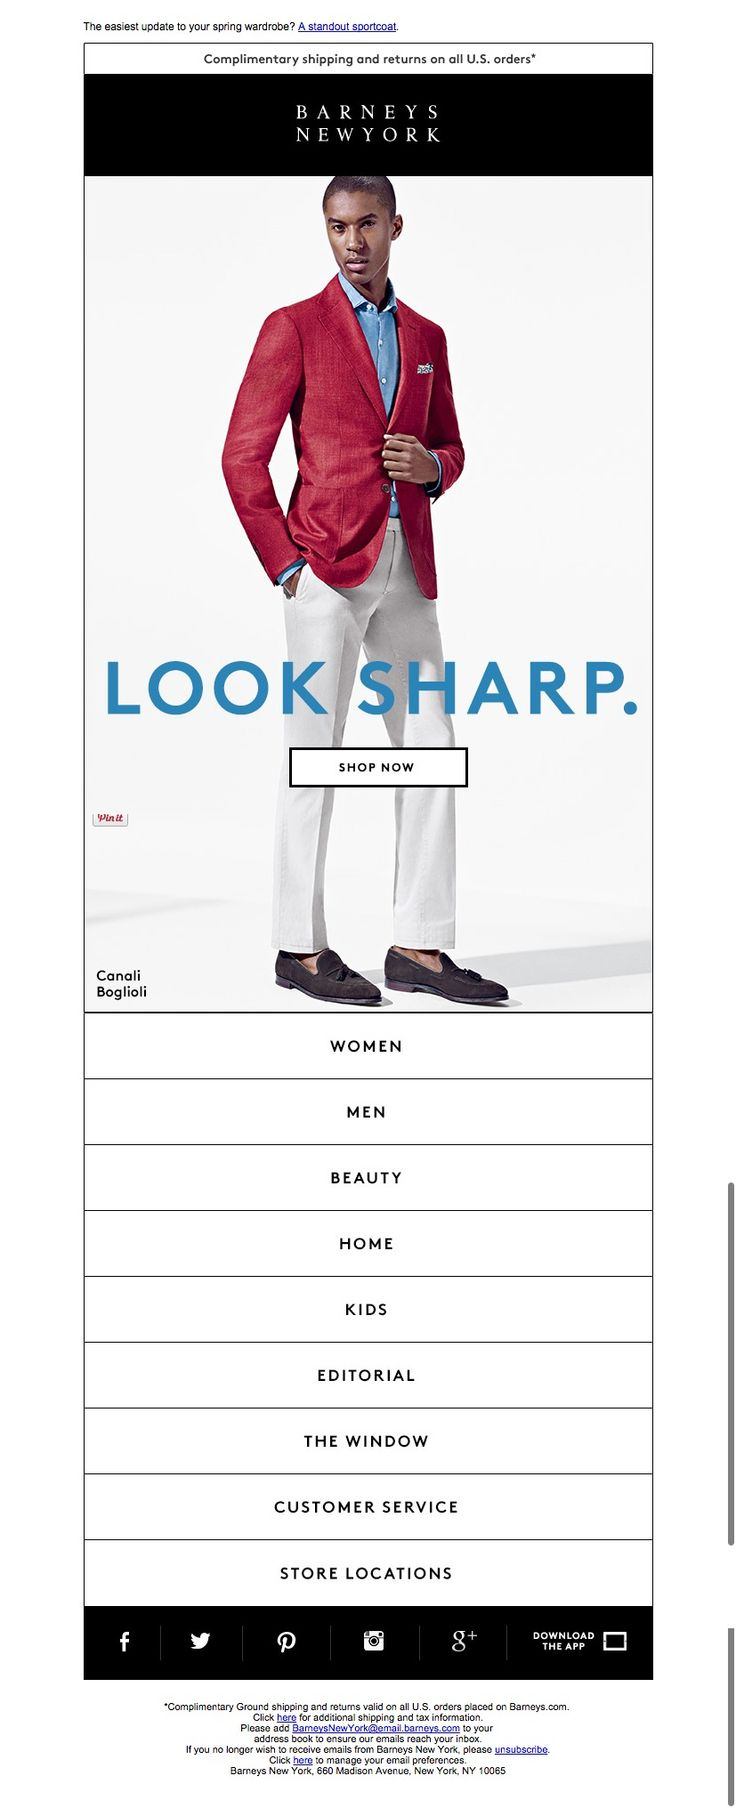 #newsletter Barneys NY 03.2015 Jacket Required: Shop Spring Sportcoats for Men